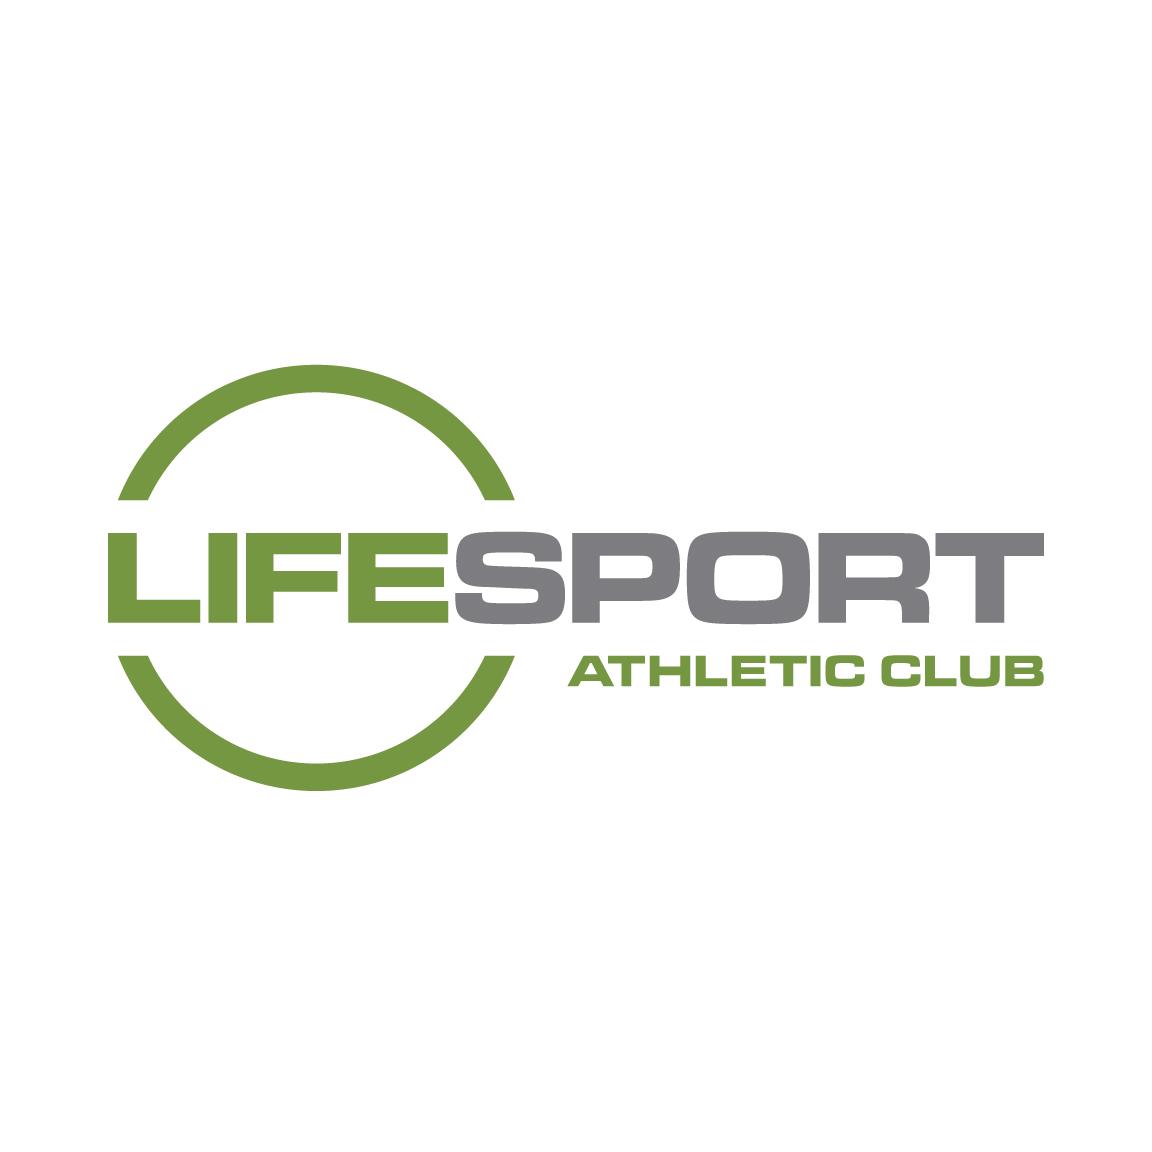 LifeSport Athletic Club - Libertyville Logo